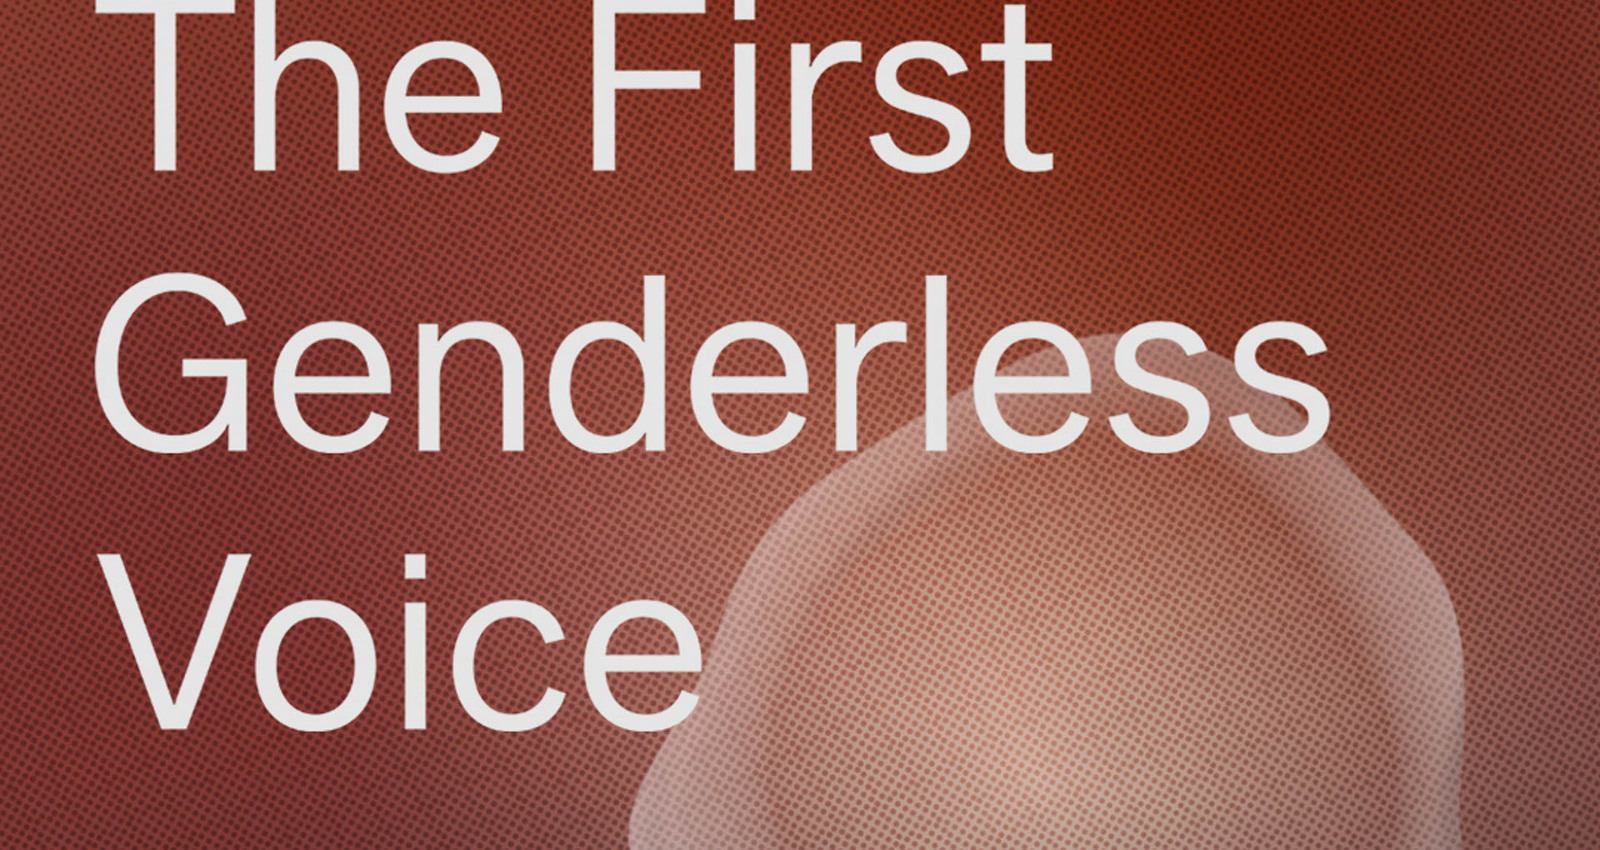 Meet Q, The Genderless Voice